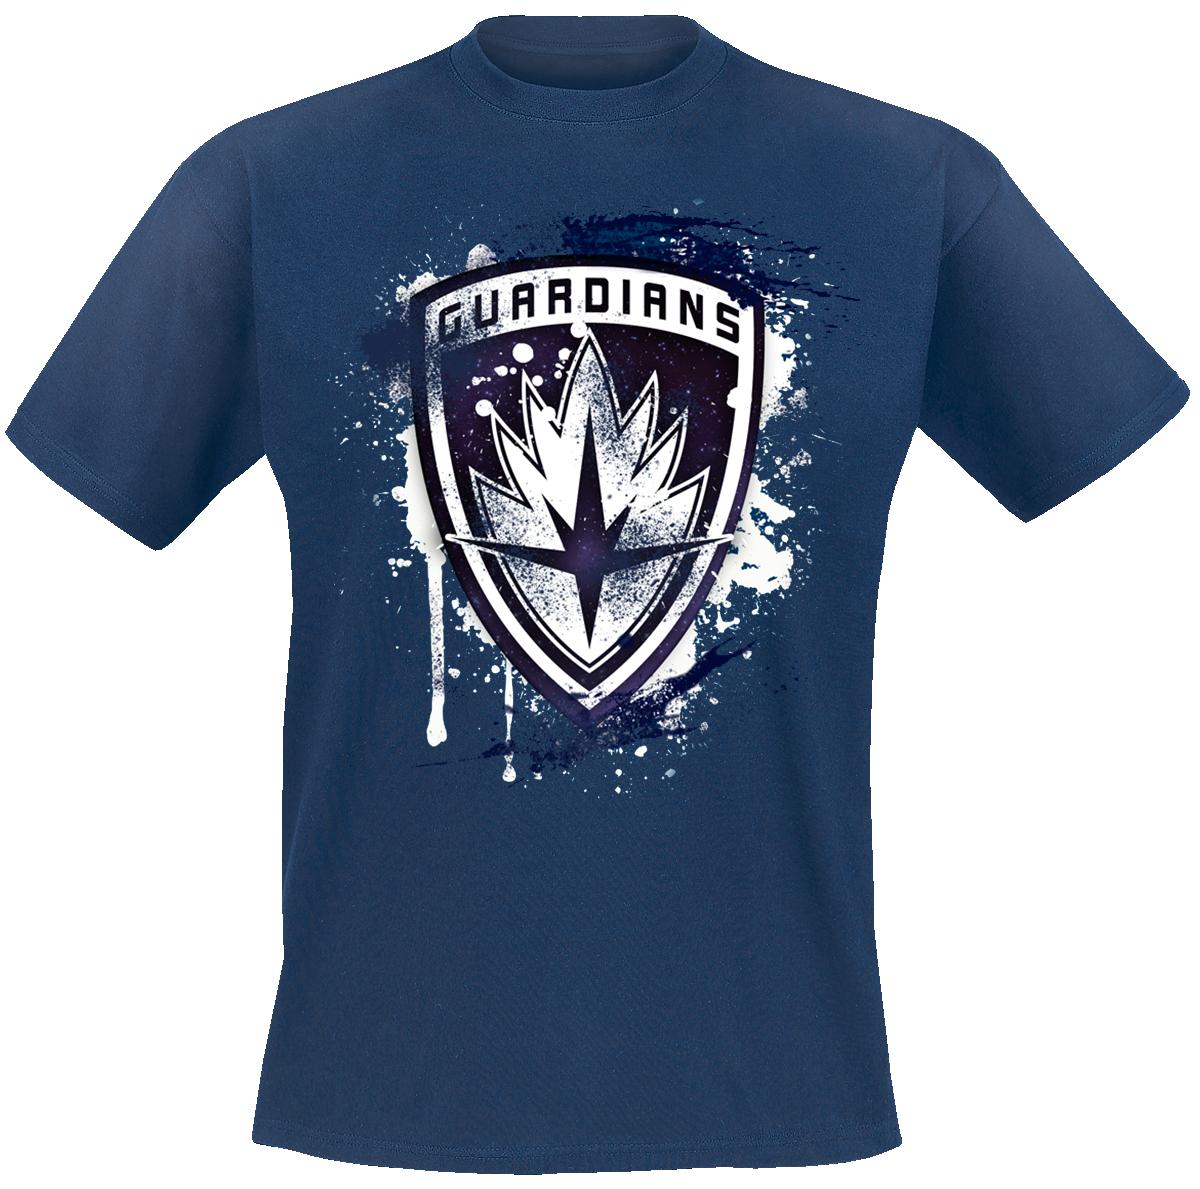 Guardians Of The Galaxy - Logo - T-Shirt - navy image